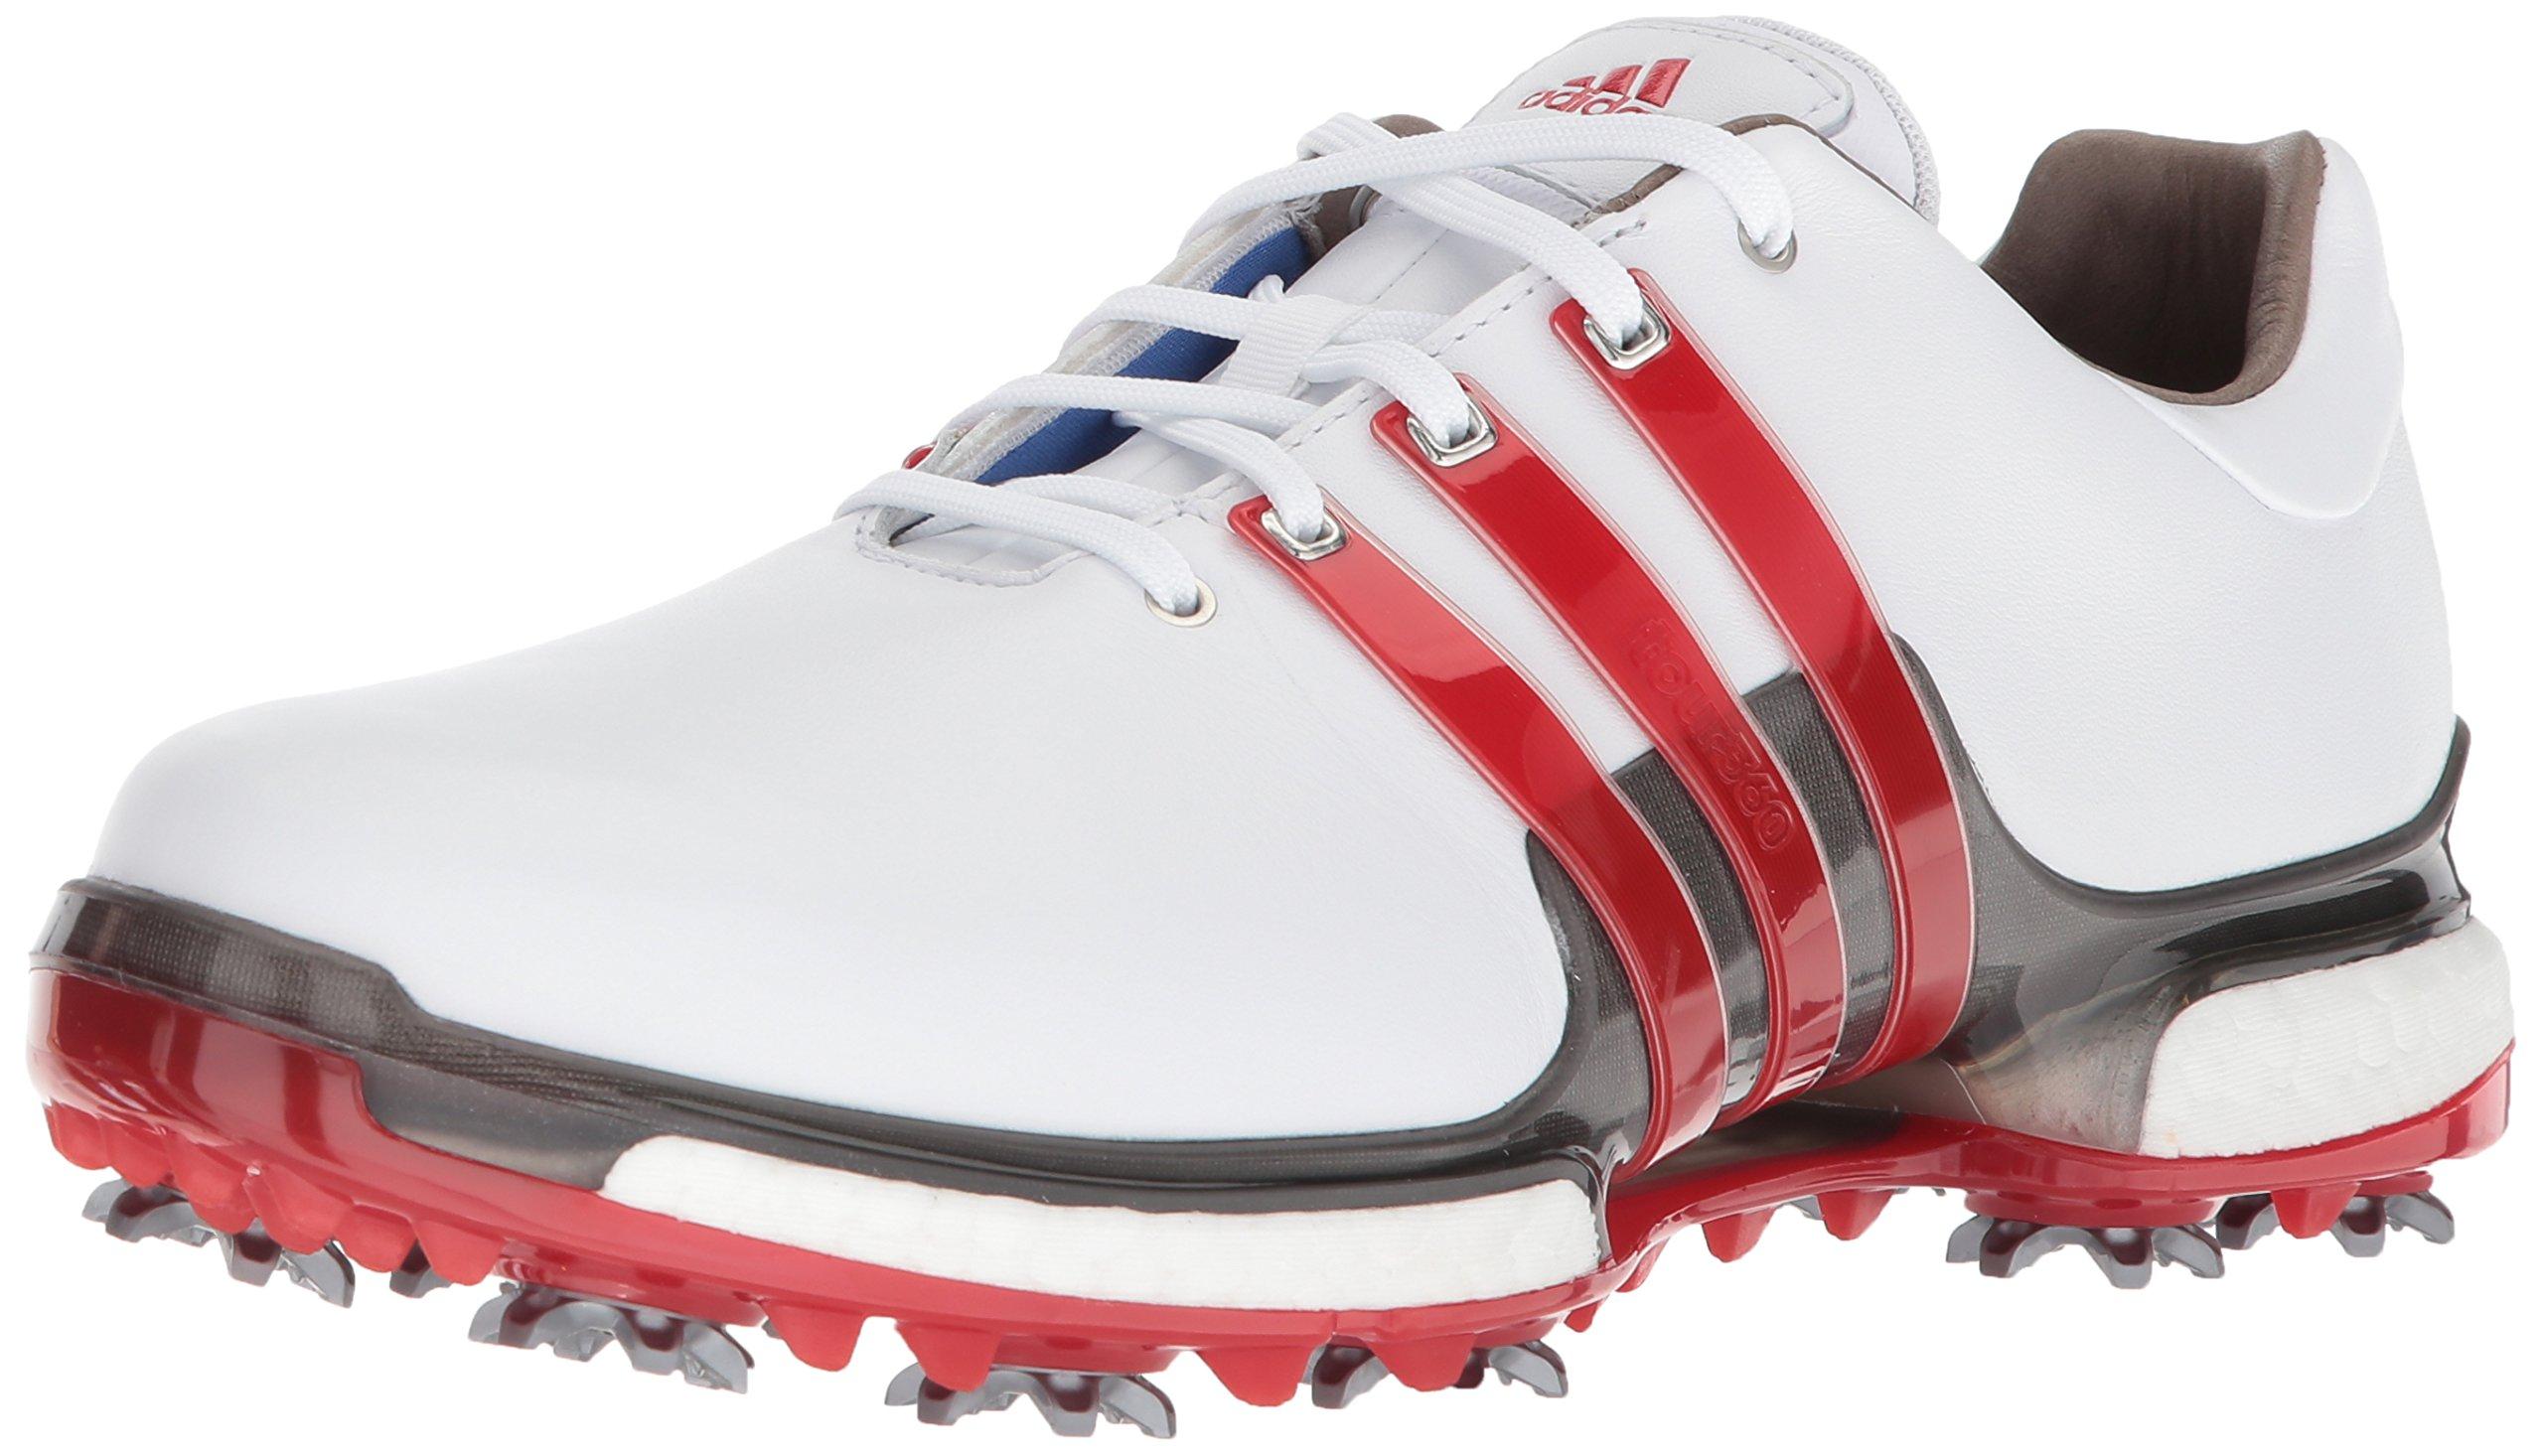 adidas Men's TOUR 360 2.0 Golf Shoe, White/Scarlet/Dark Silver Metallic, 7 M US